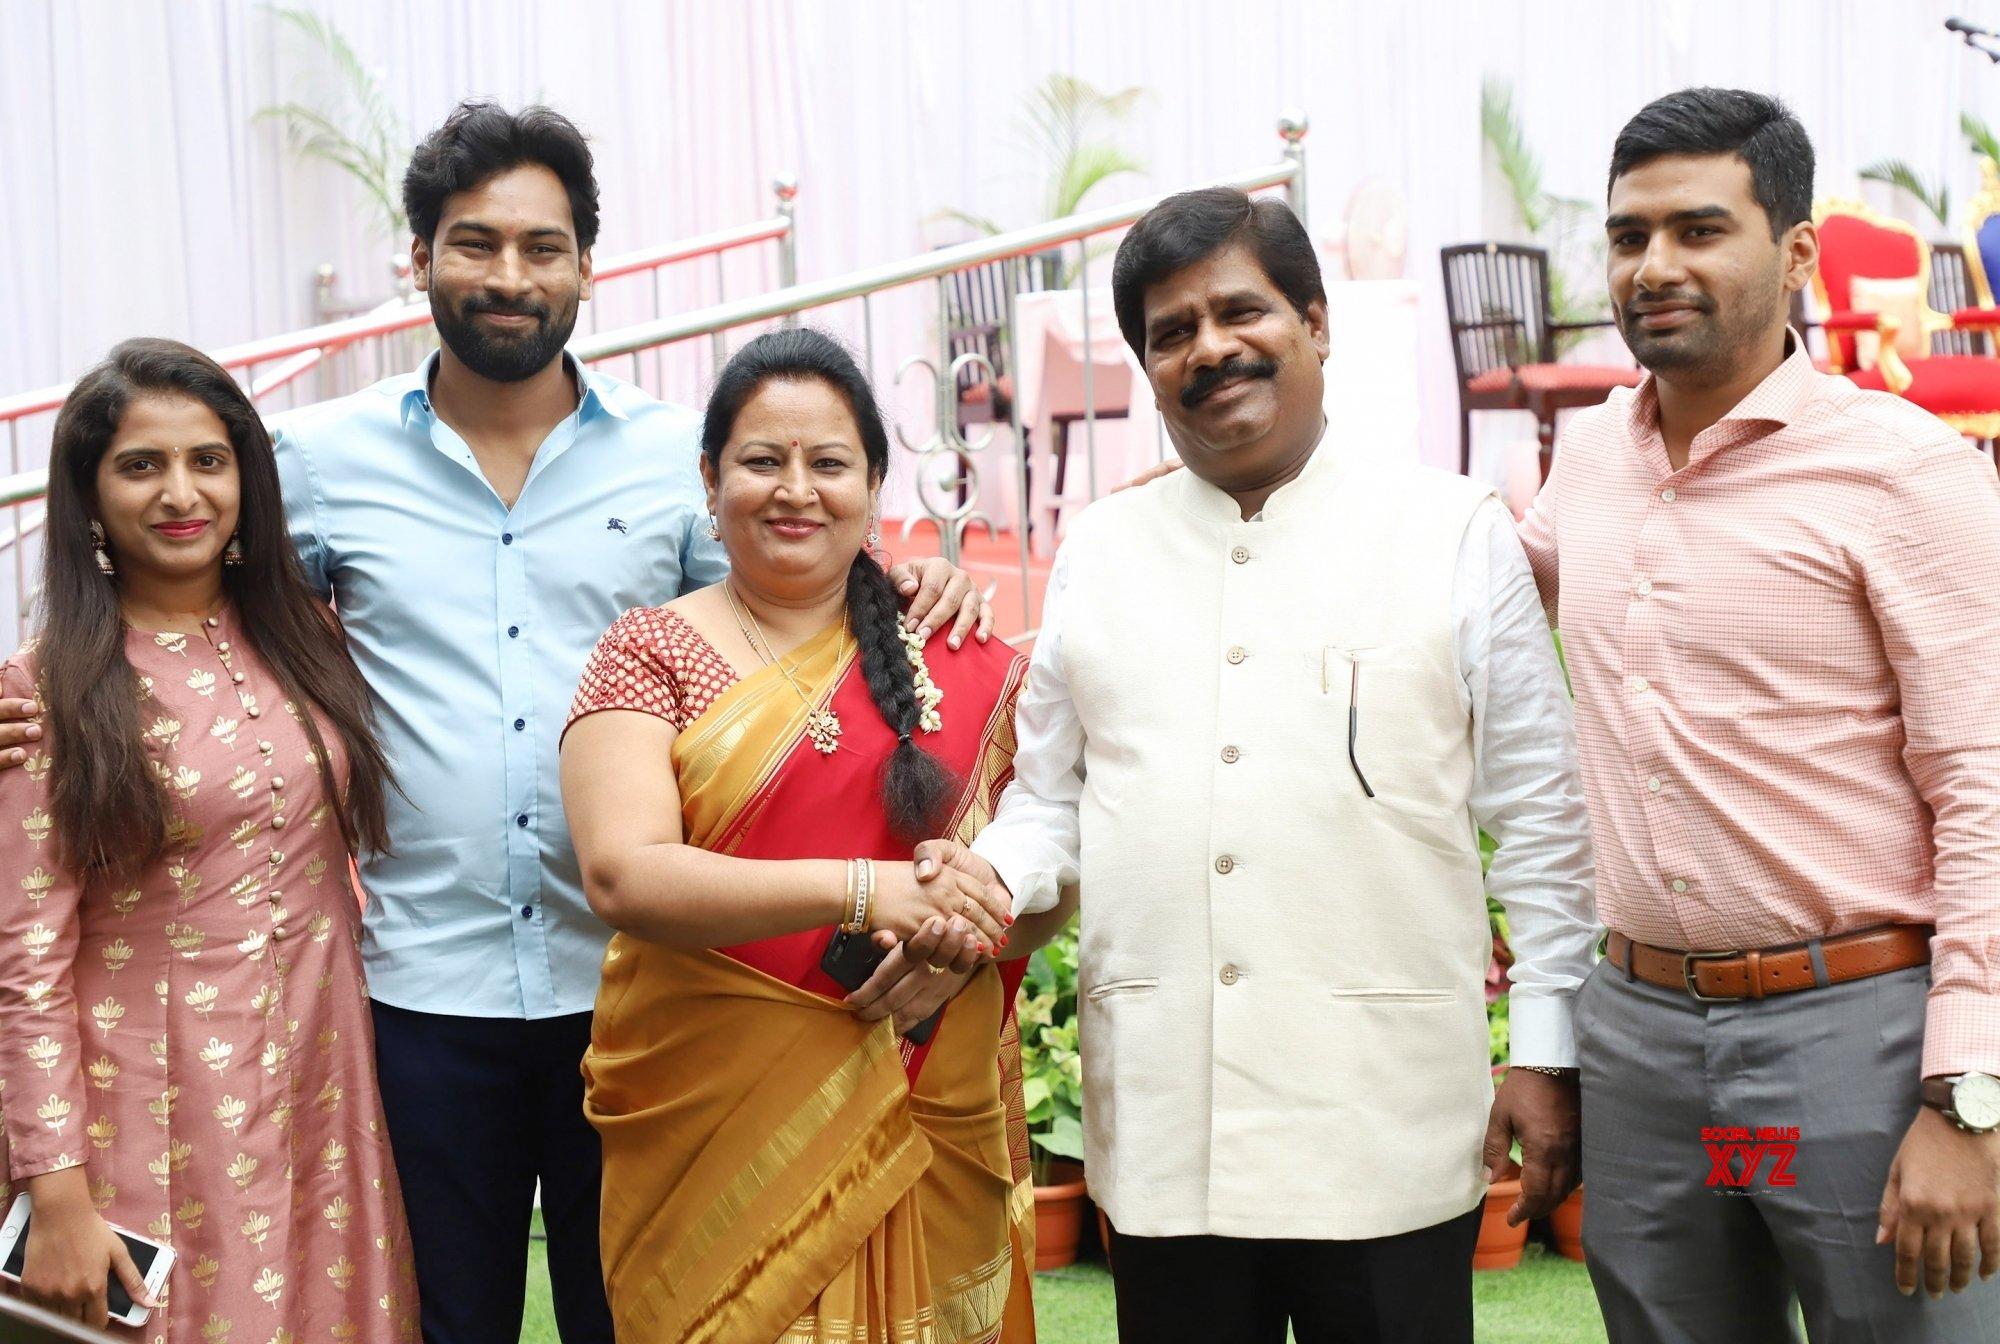 Bengaluru: 2 ministers inducted in Karnataka Cabinet #Gallery